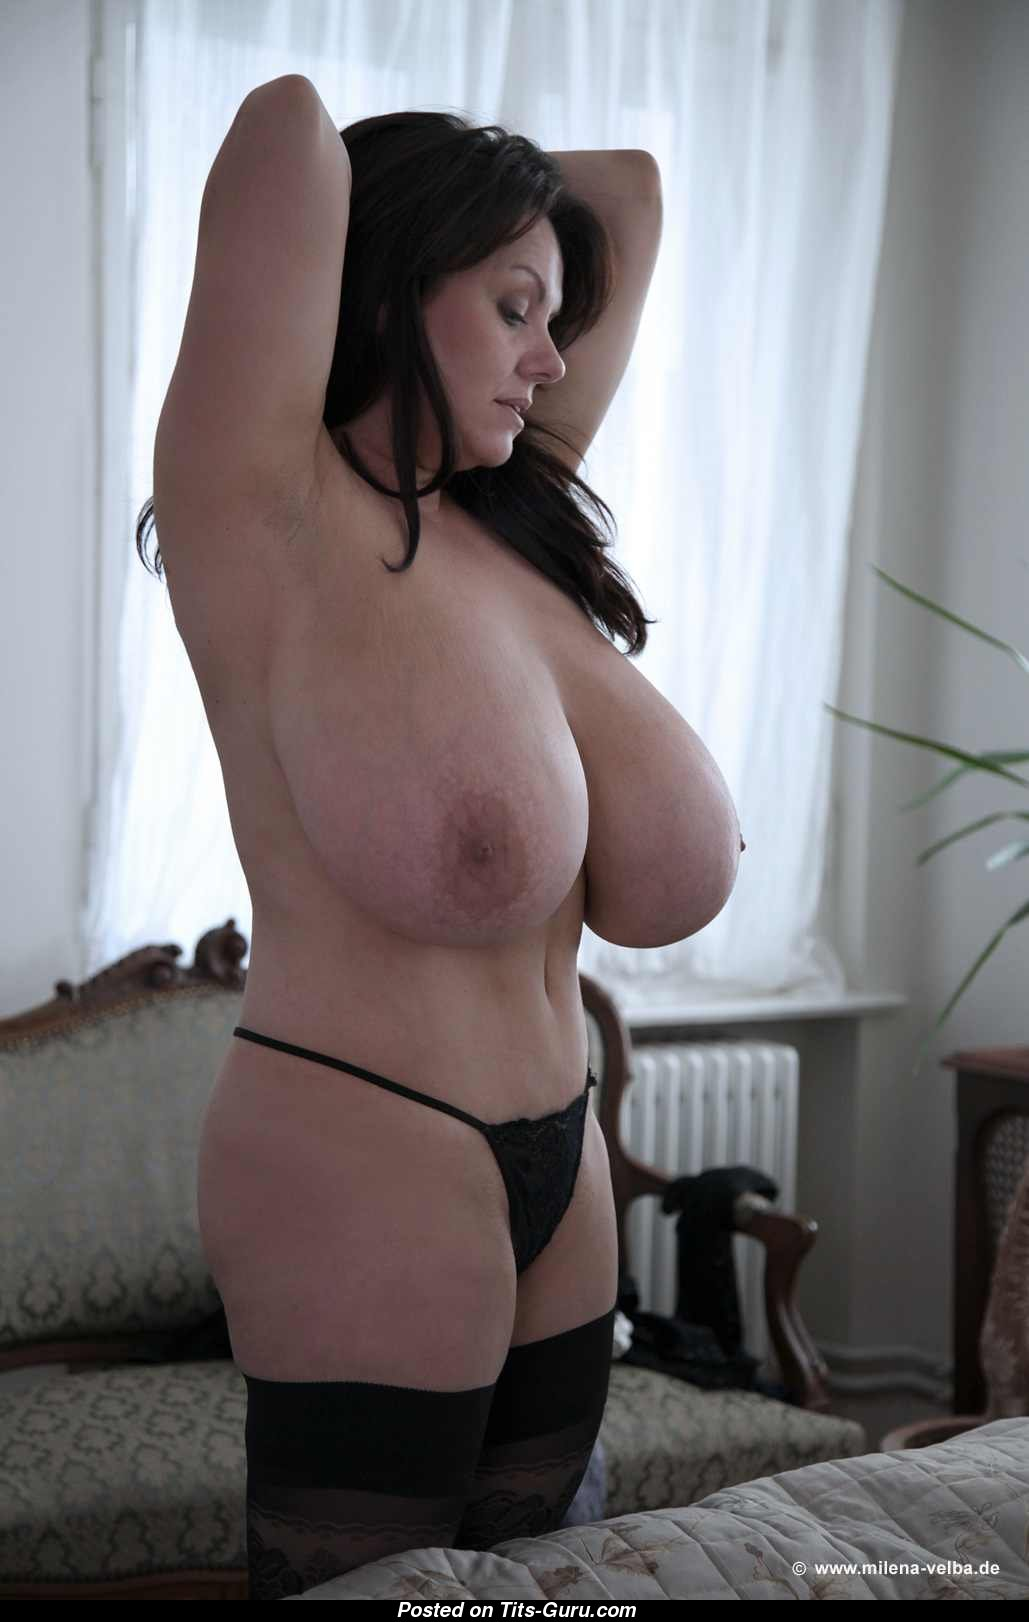 Milena topless video, comedy porn nude girl